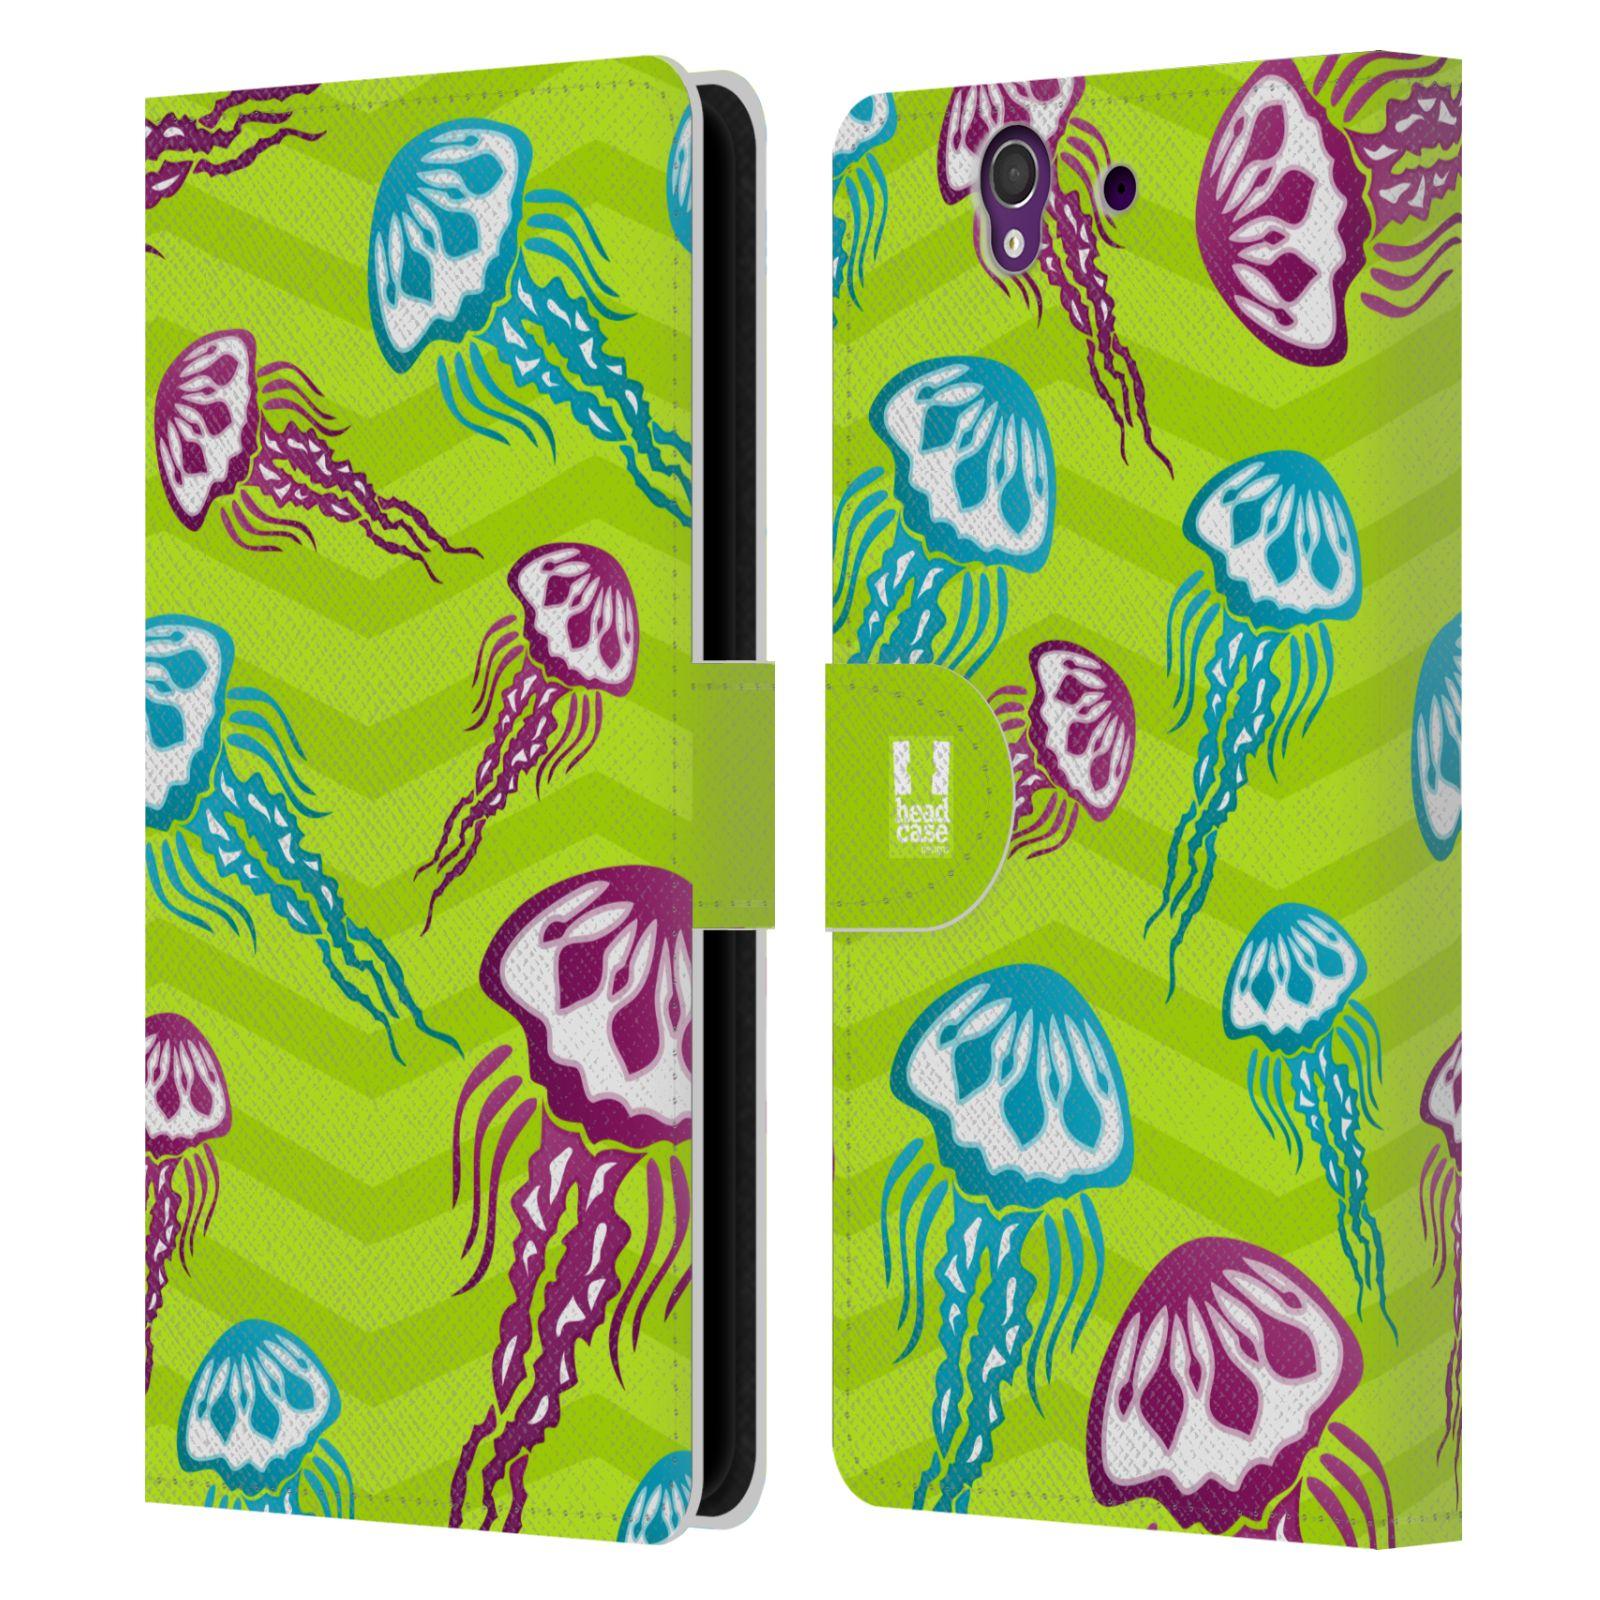 HEAD CASE Flipové pouzdro pro mobil SONY XPERIA Z (C6603) Mořský živočich medůza zelená barva